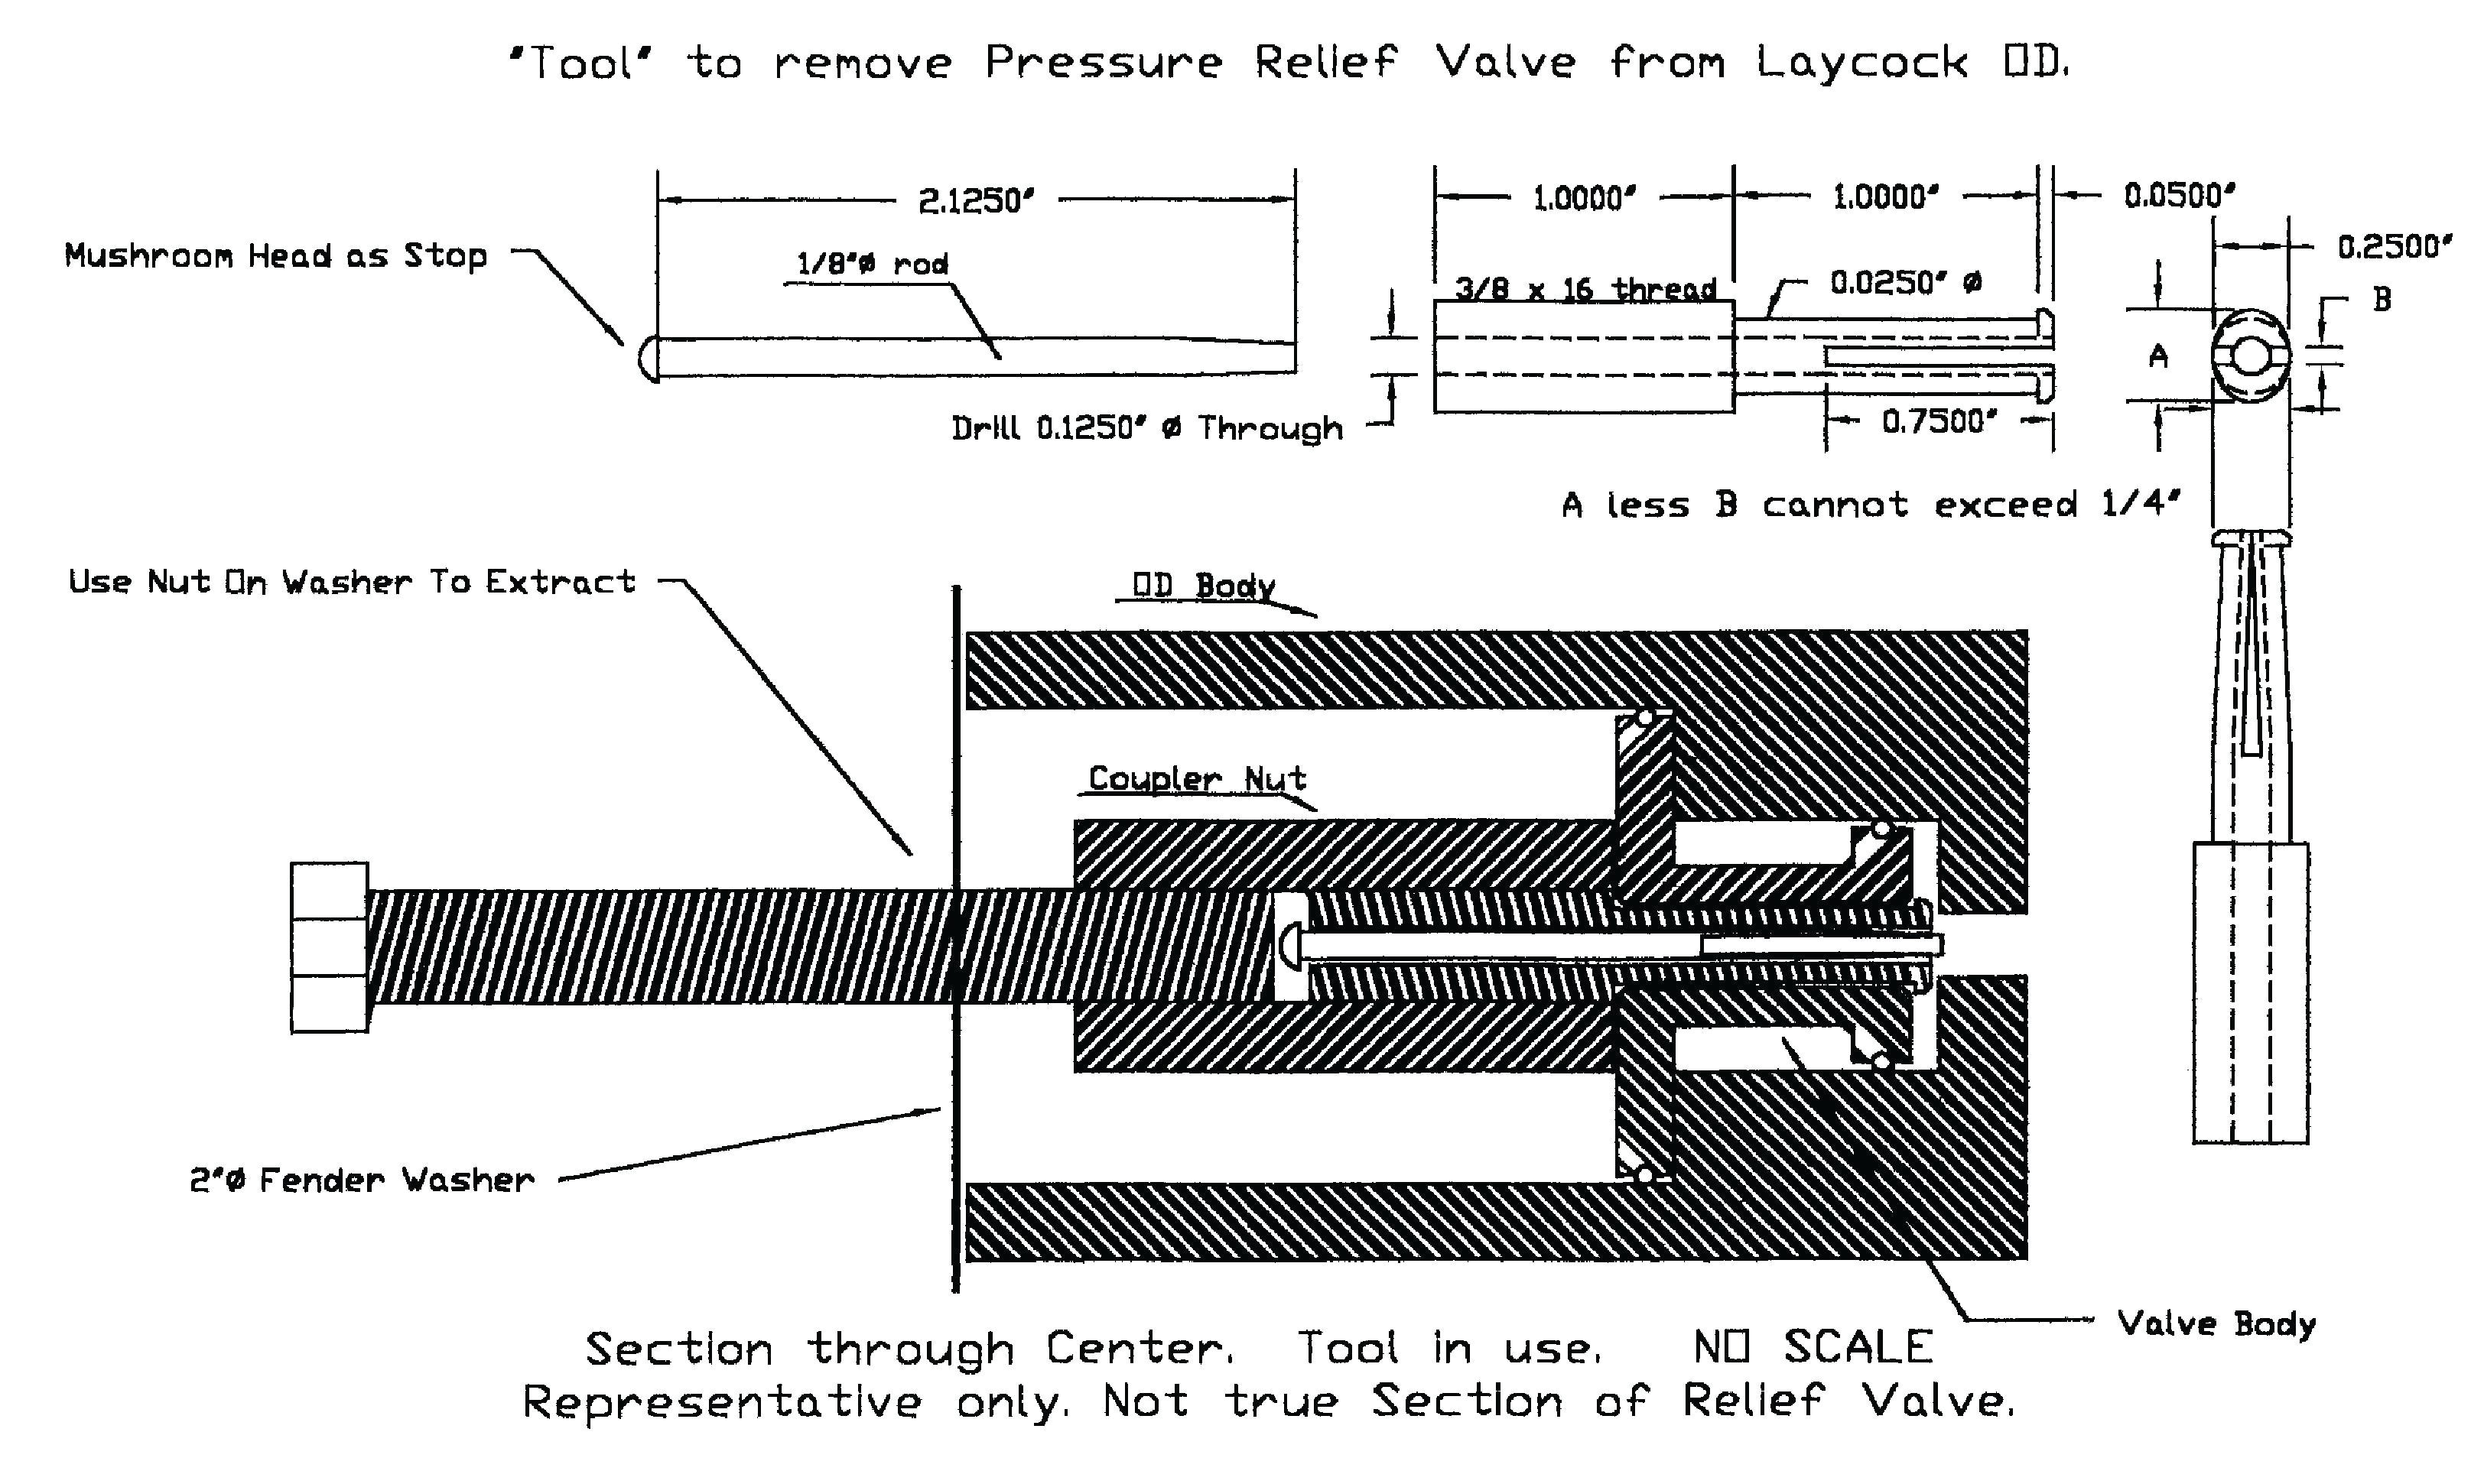 light switch 2 way wiring diagram luxury two way light switch wiring diagram electrical circuit wiring